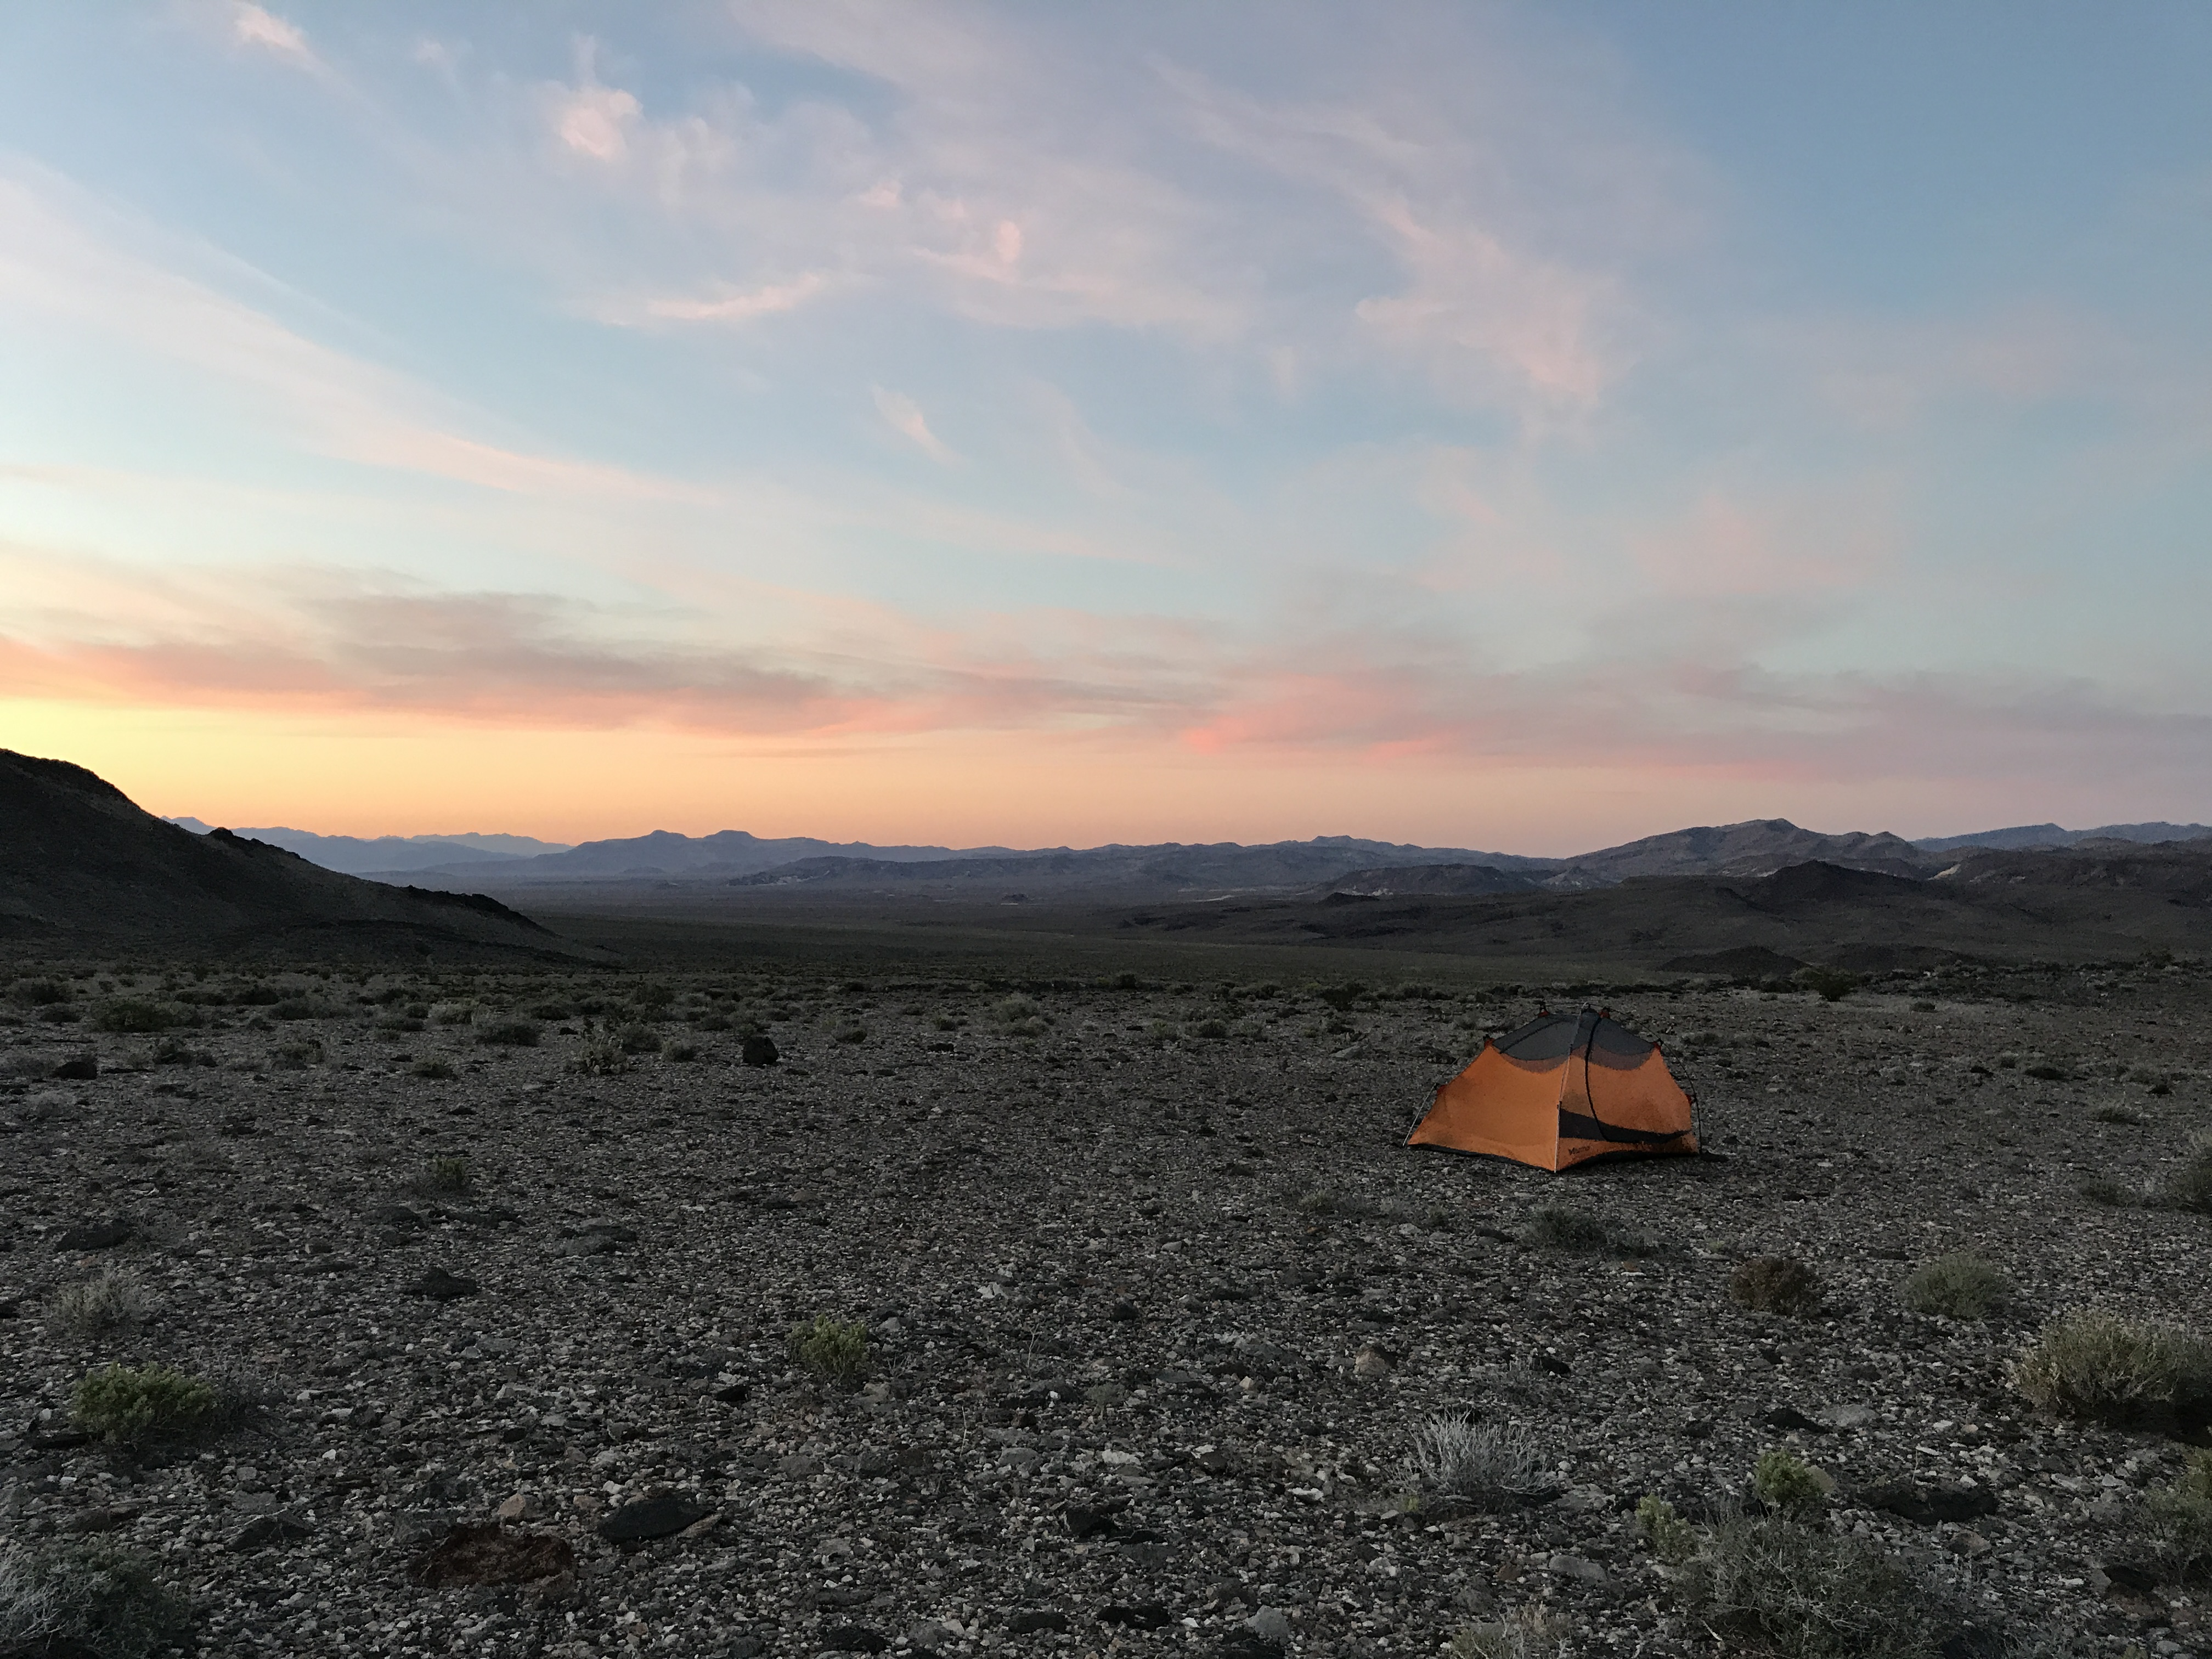 Early morning Pyramid Peak base camp